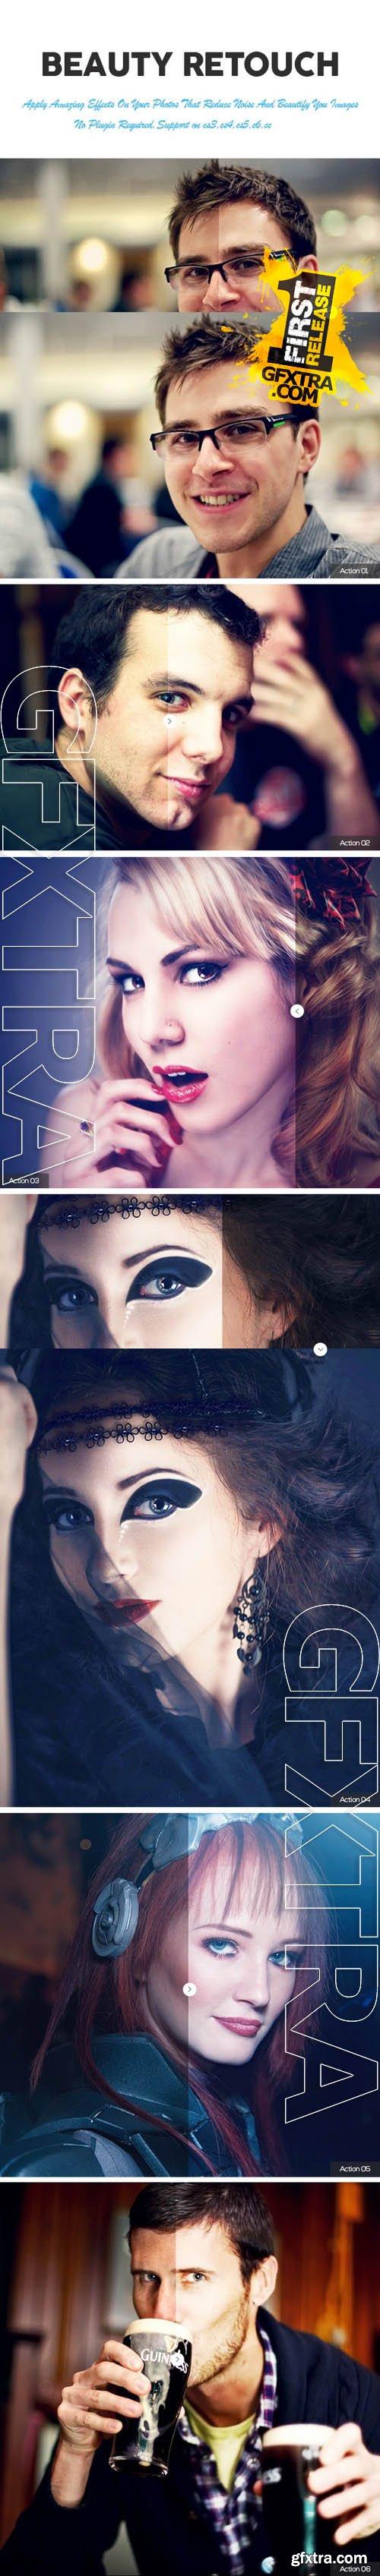 Beauty Retouch Photoshop Action - GraphicRiver 11411734